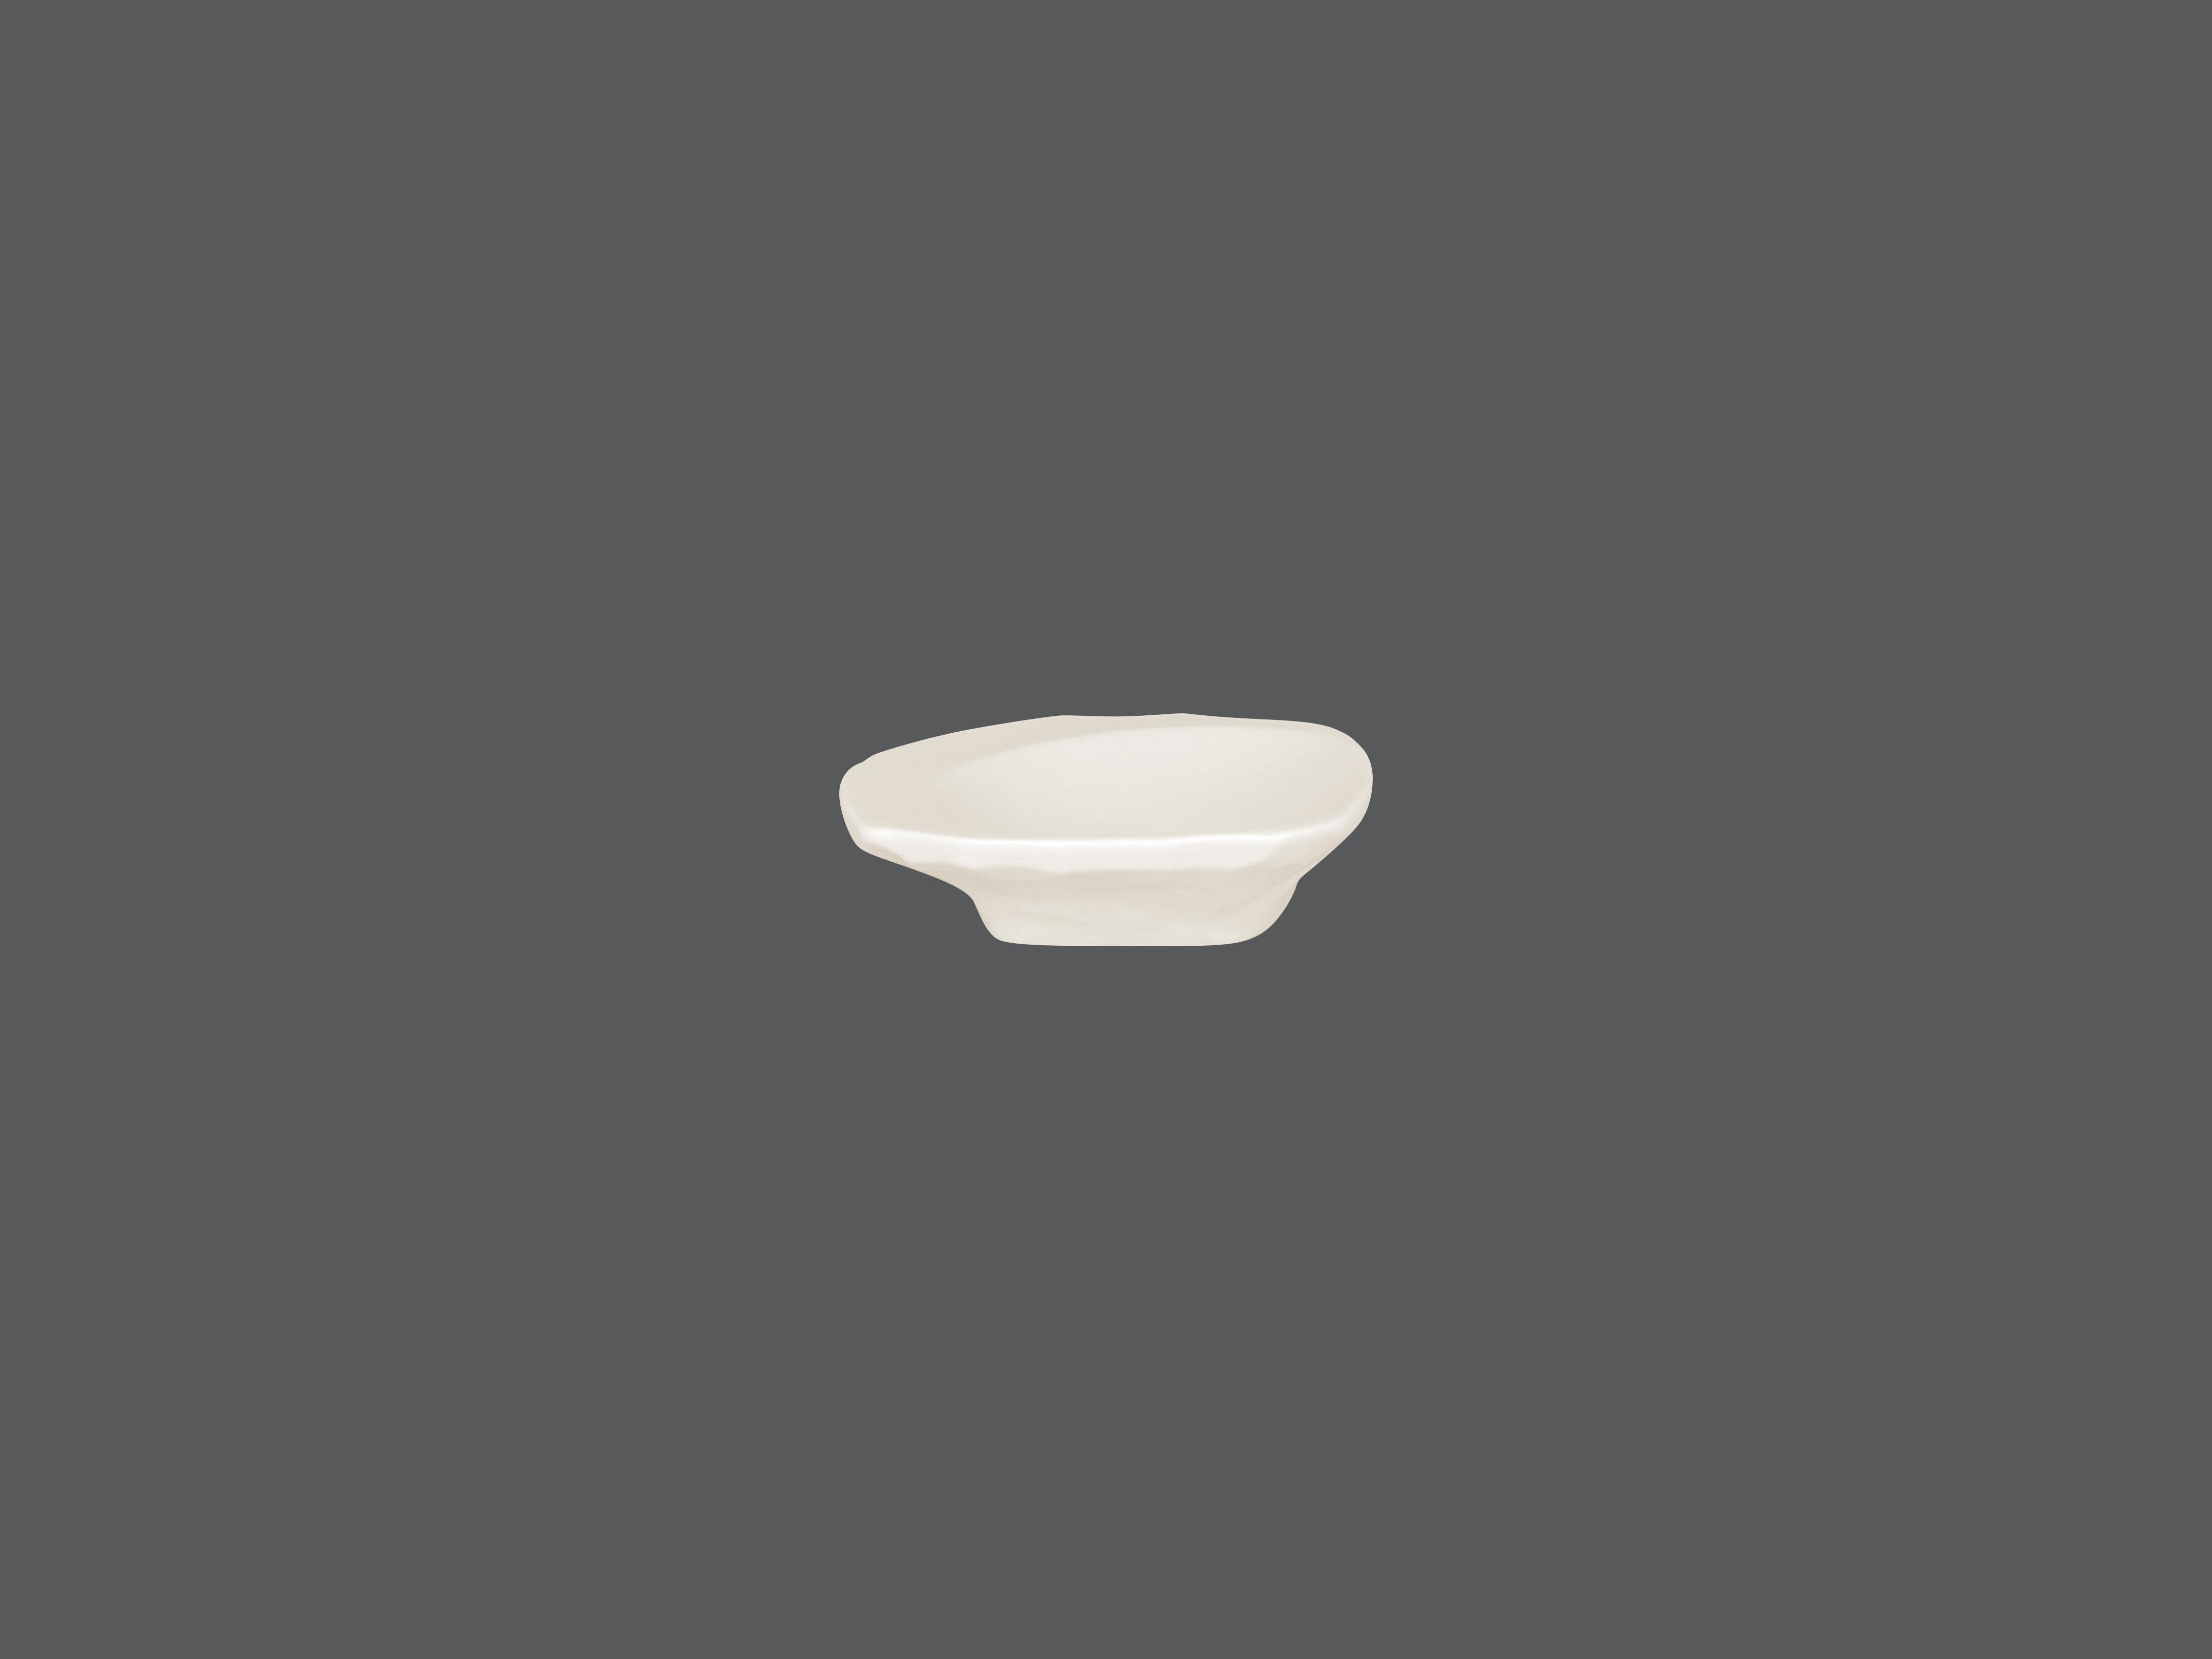 Miska řezaná 10 cm